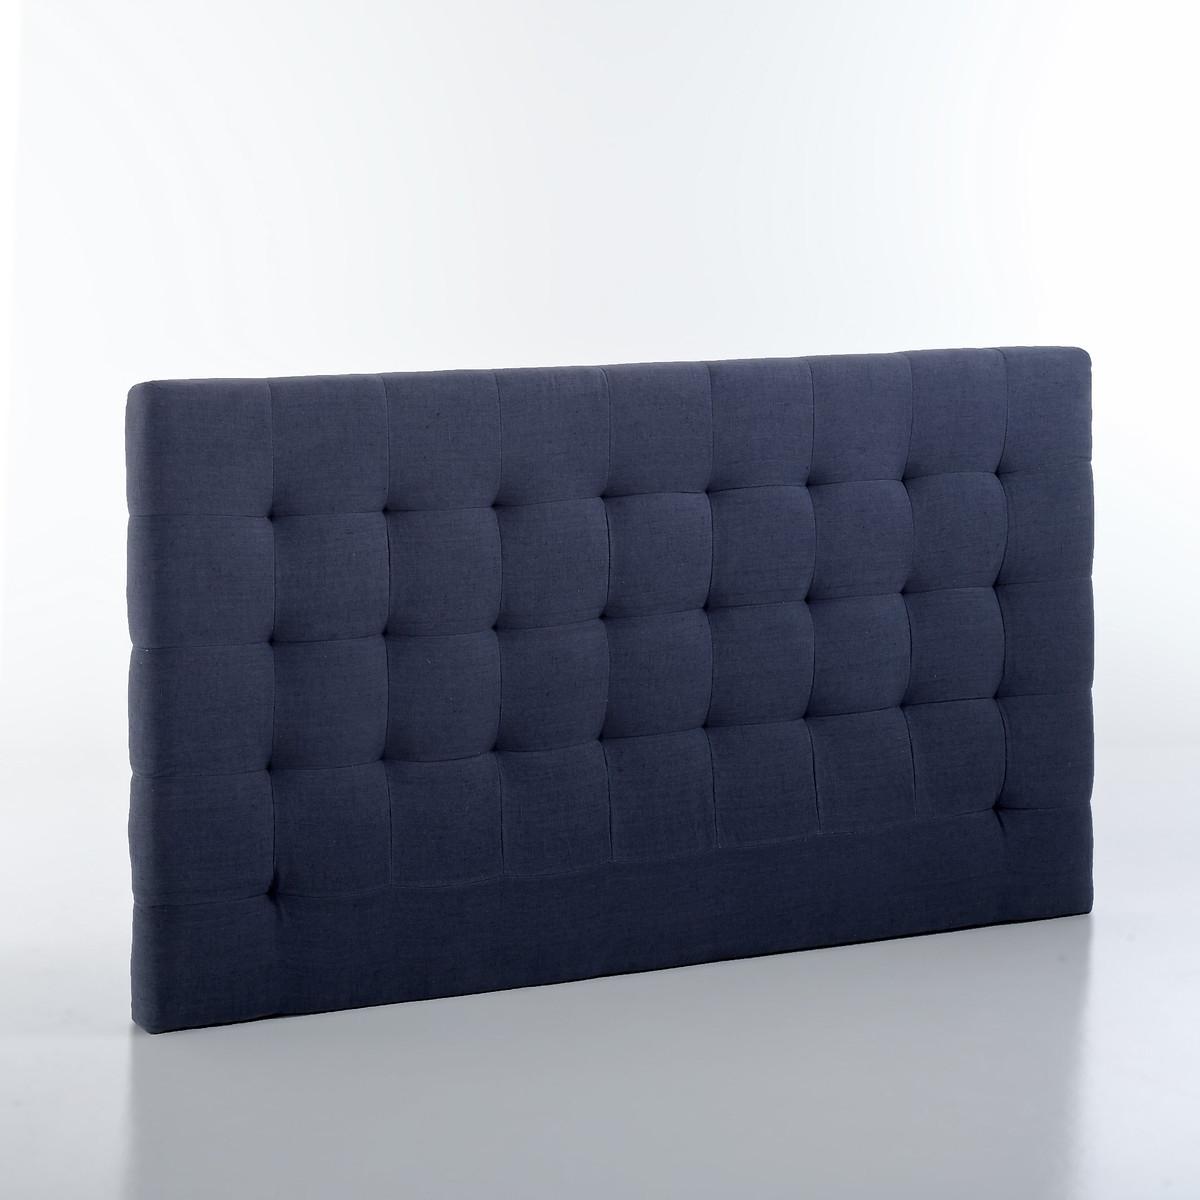 Изголовье LaRedoute Кровати мягкое Selve В 100 см 140 см синий кровати 140 см